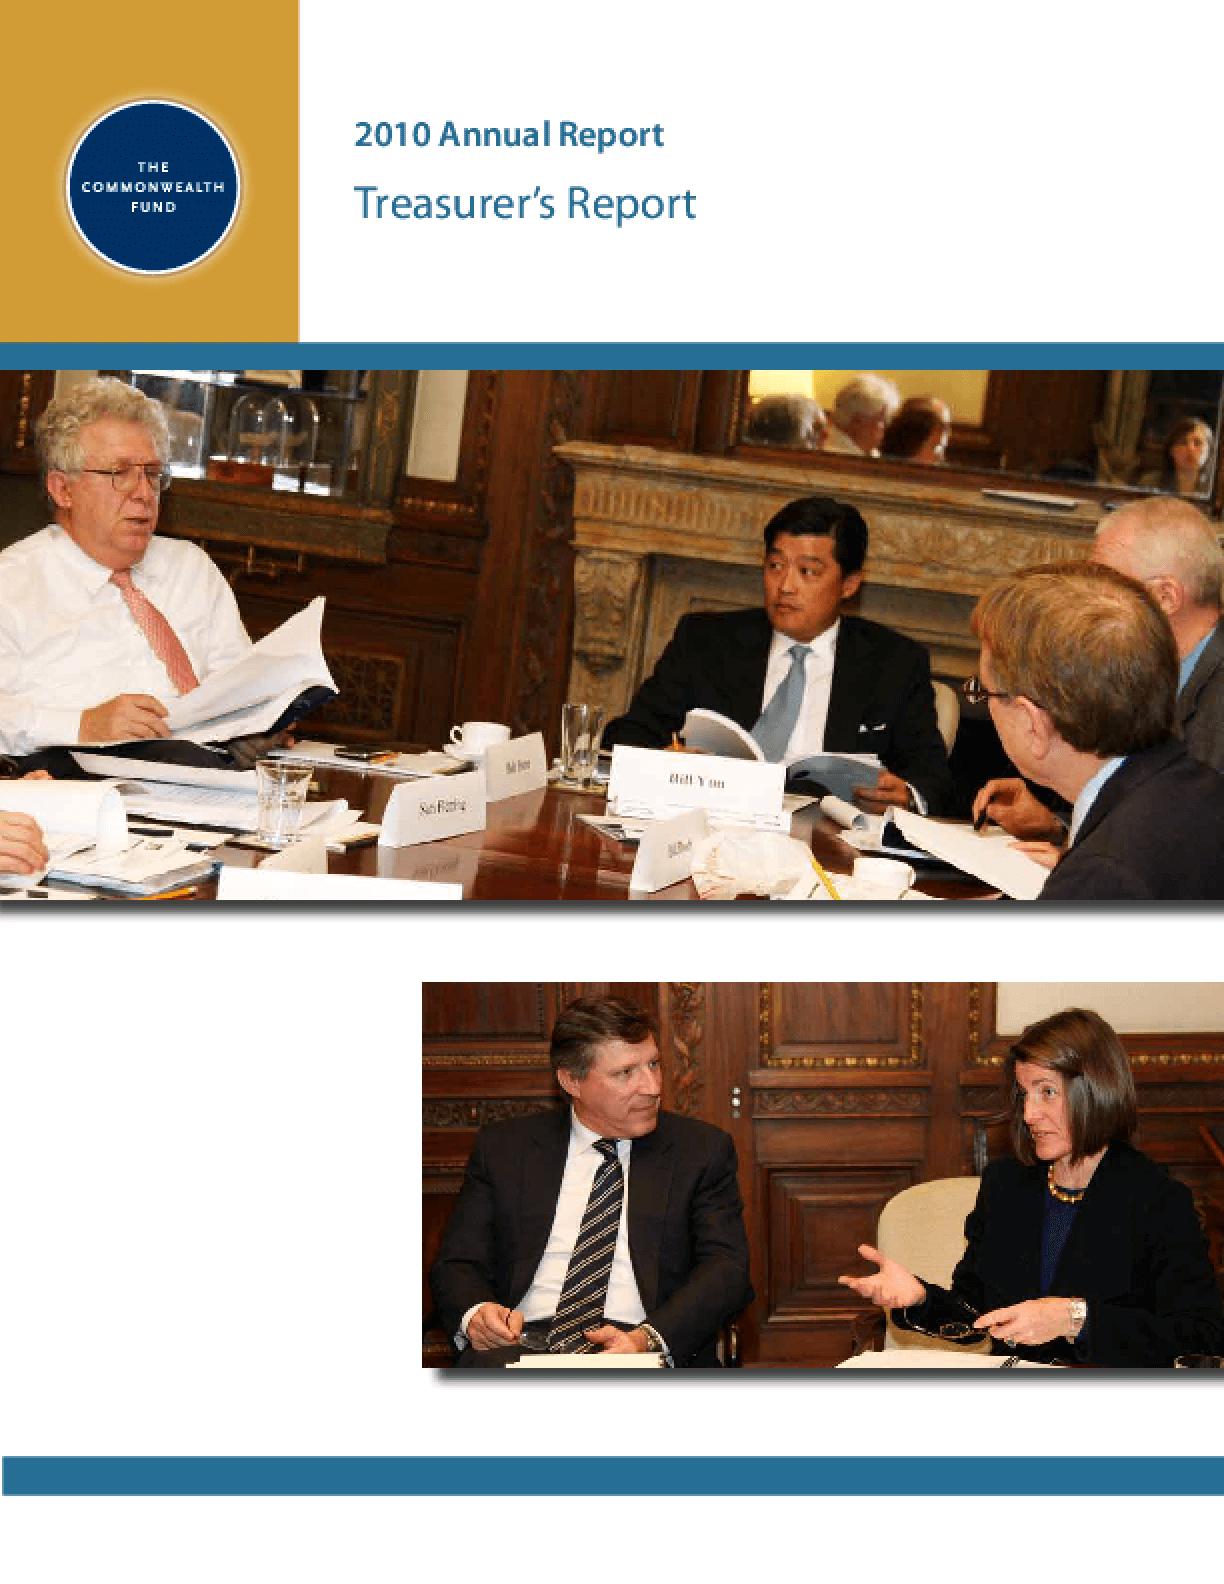 Commonwealth Fund - 2010 Annual Report: Treasurer's Report